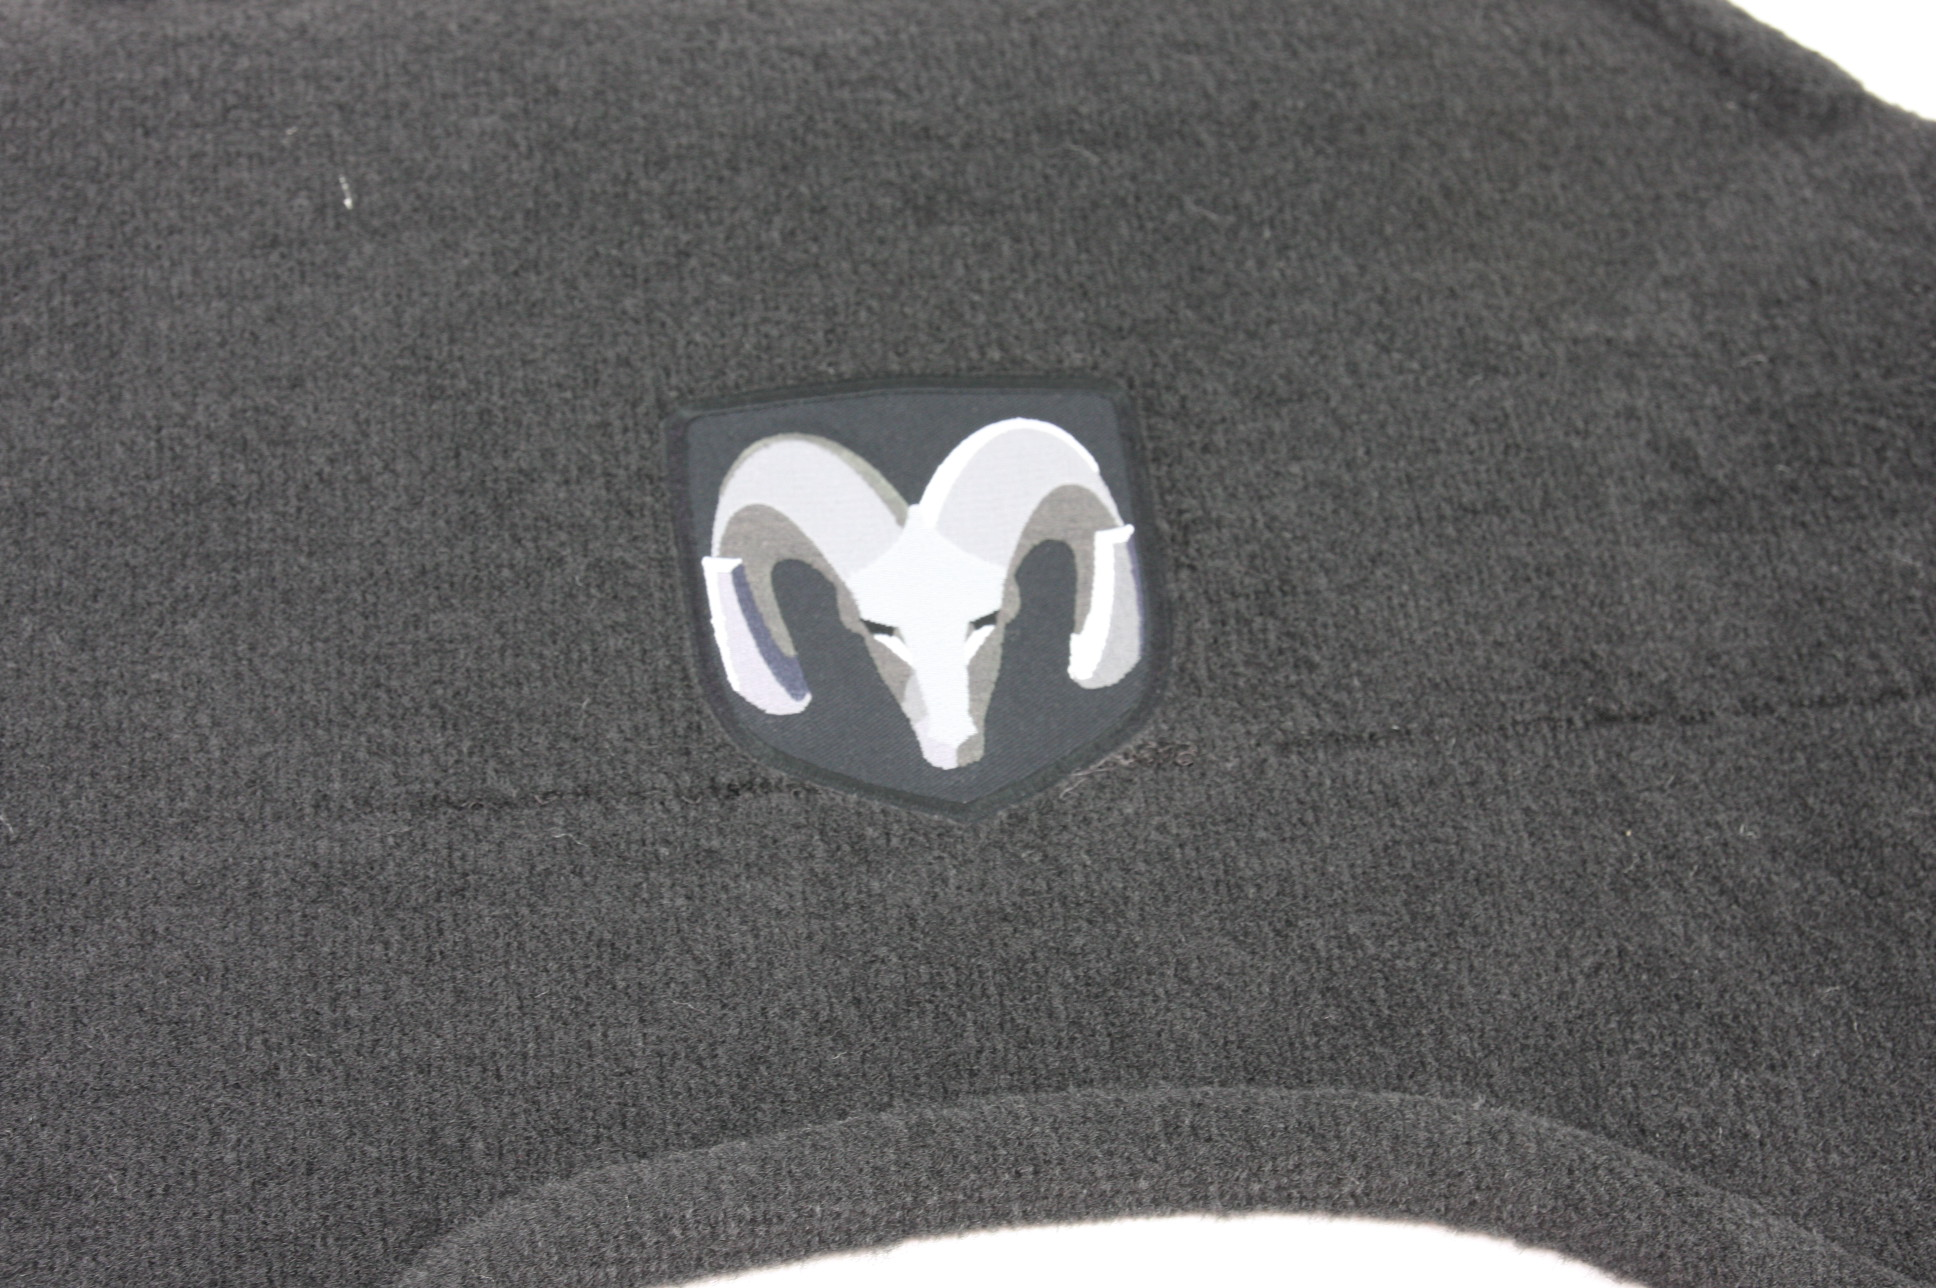 *** New OEM 82207050 02-05 Dodge Ram w/ Logo Premium Rear Carpet Floor Mat - image 8